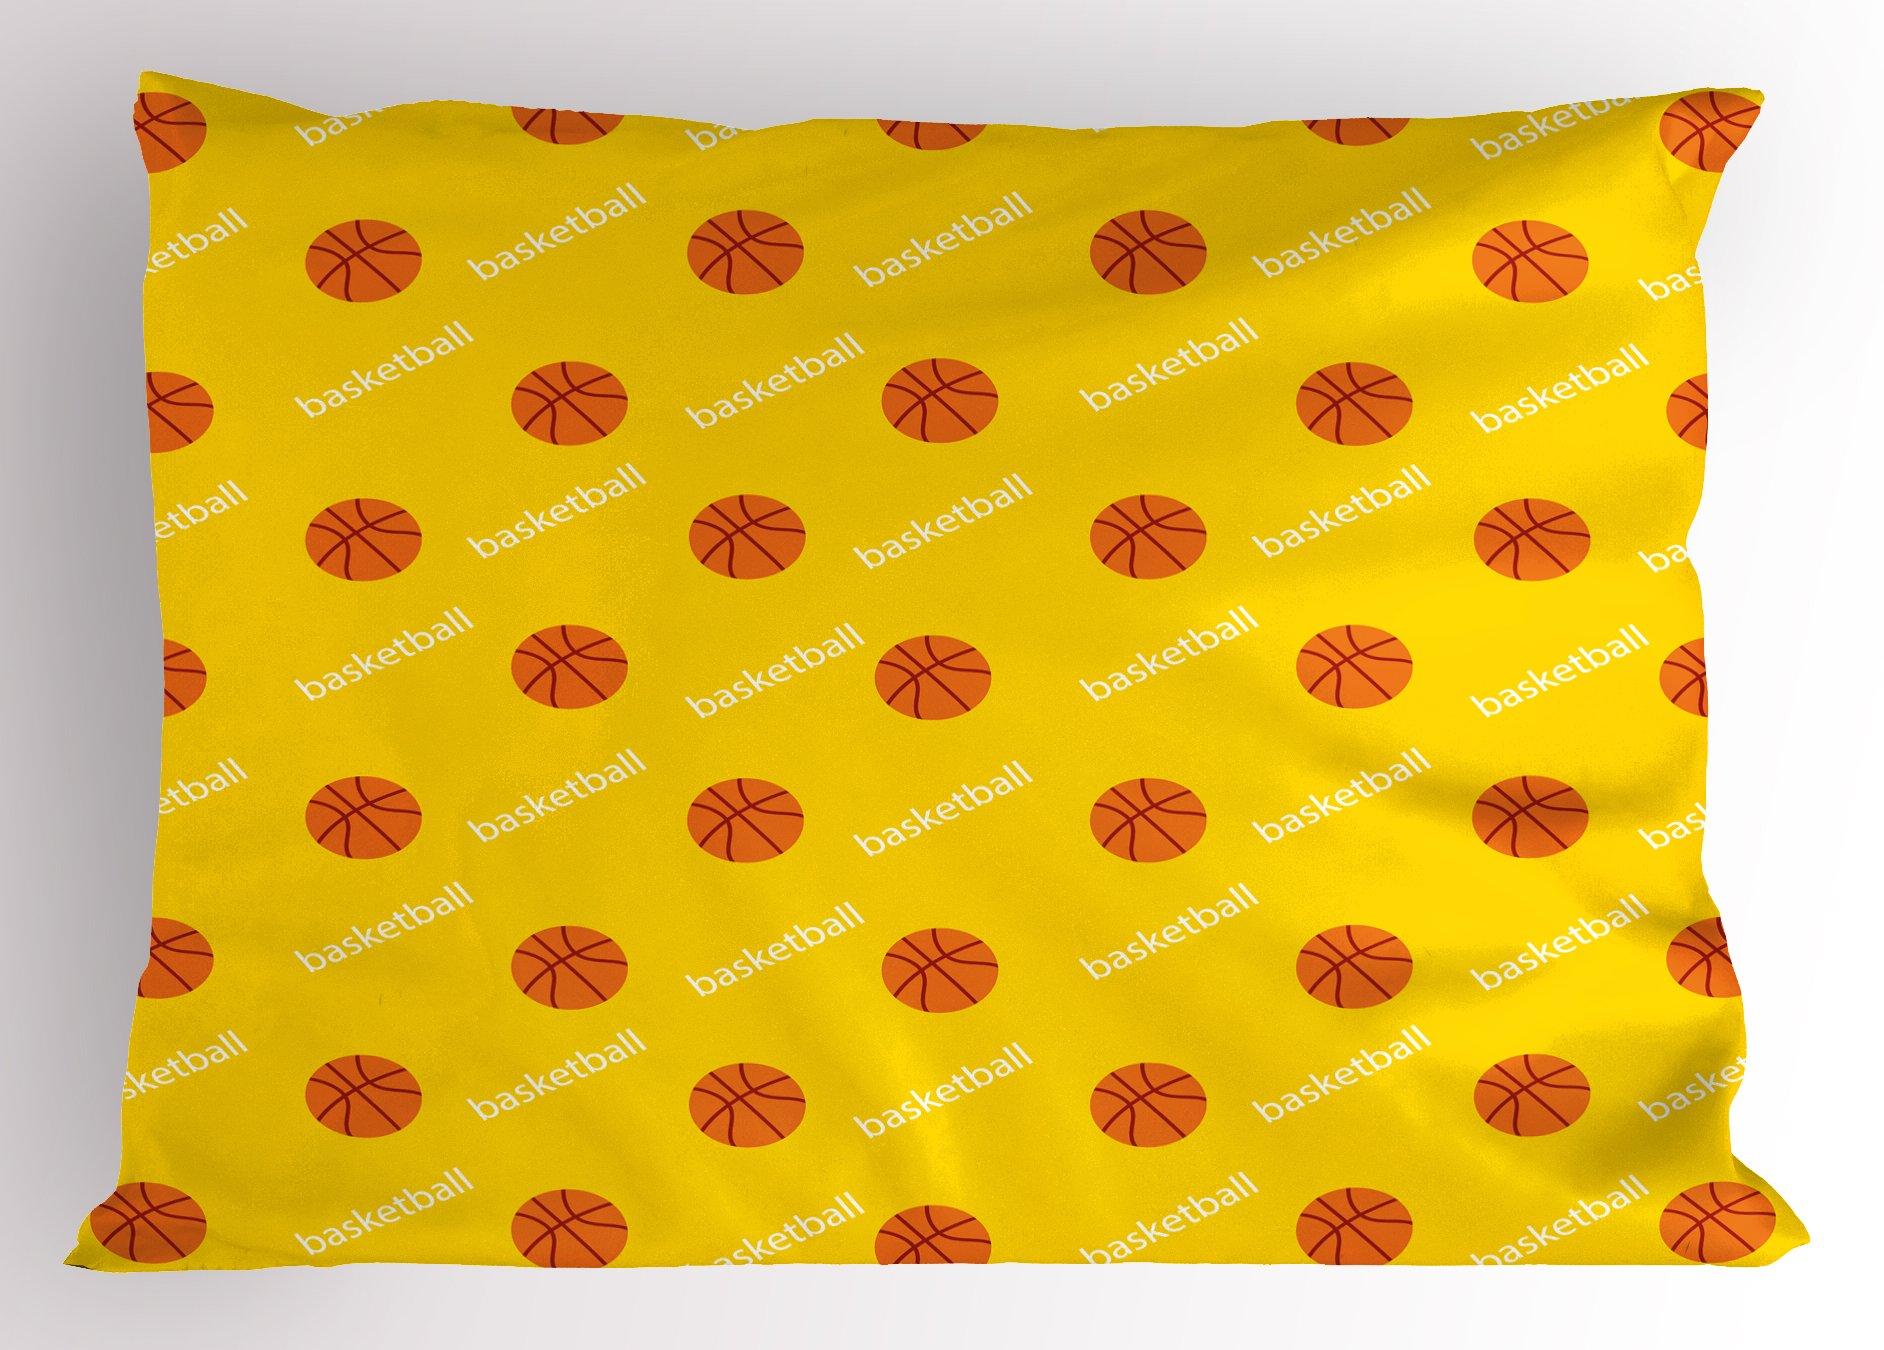 Ambesonne Basketball Pillow Sham, Athletics League Theme Balls on Yellow Backdrop Goal Fun Game Match, Decorative Standard Queen Size Printed Pillowcase, 30 X 20 inches, Yellow Orange White